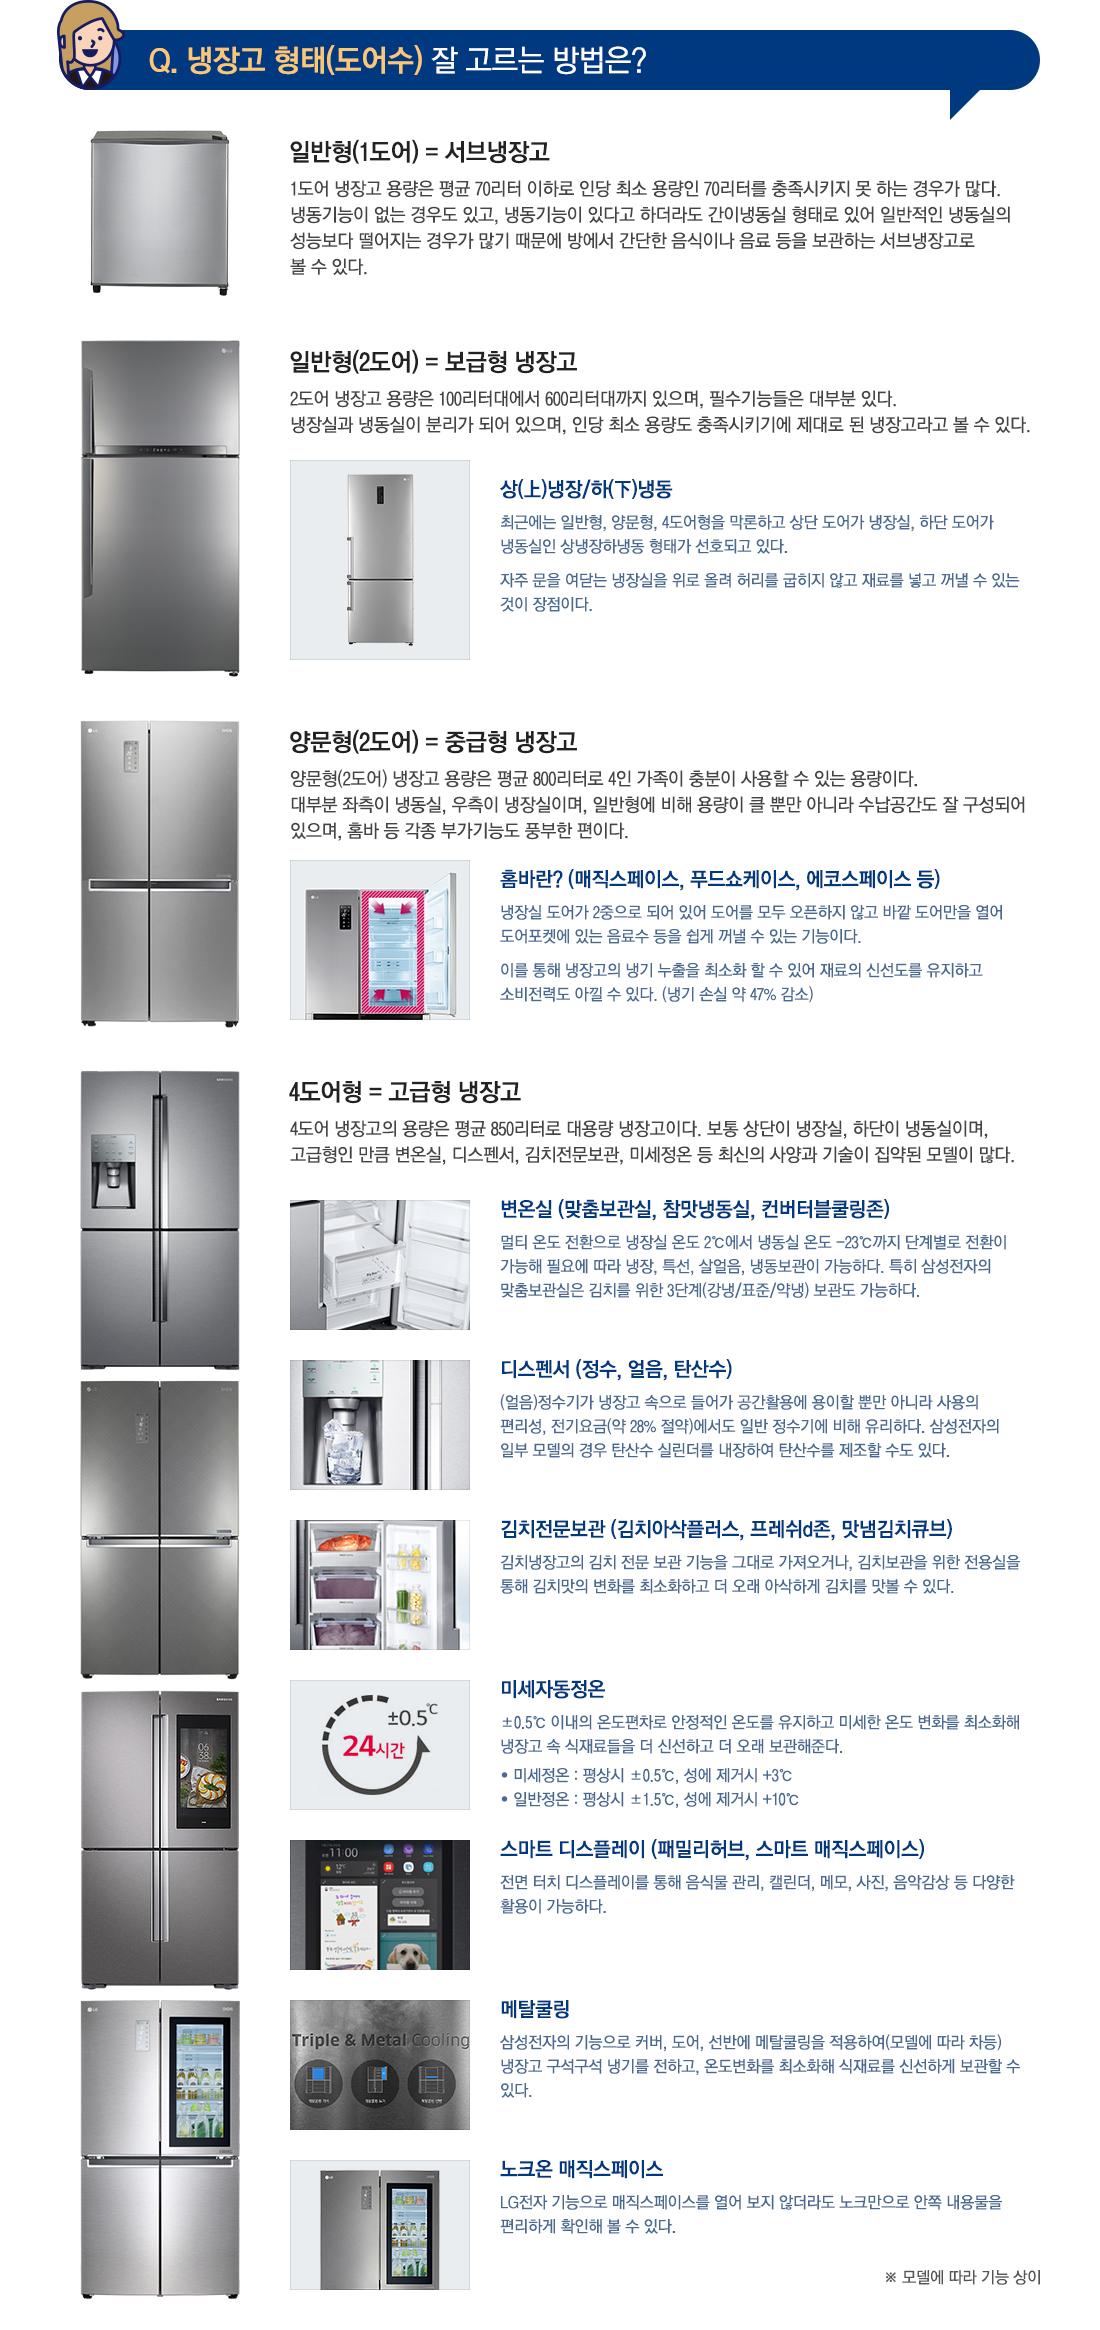 Q. 냉장고 형태(도어수) 잘 고르는 방법은?